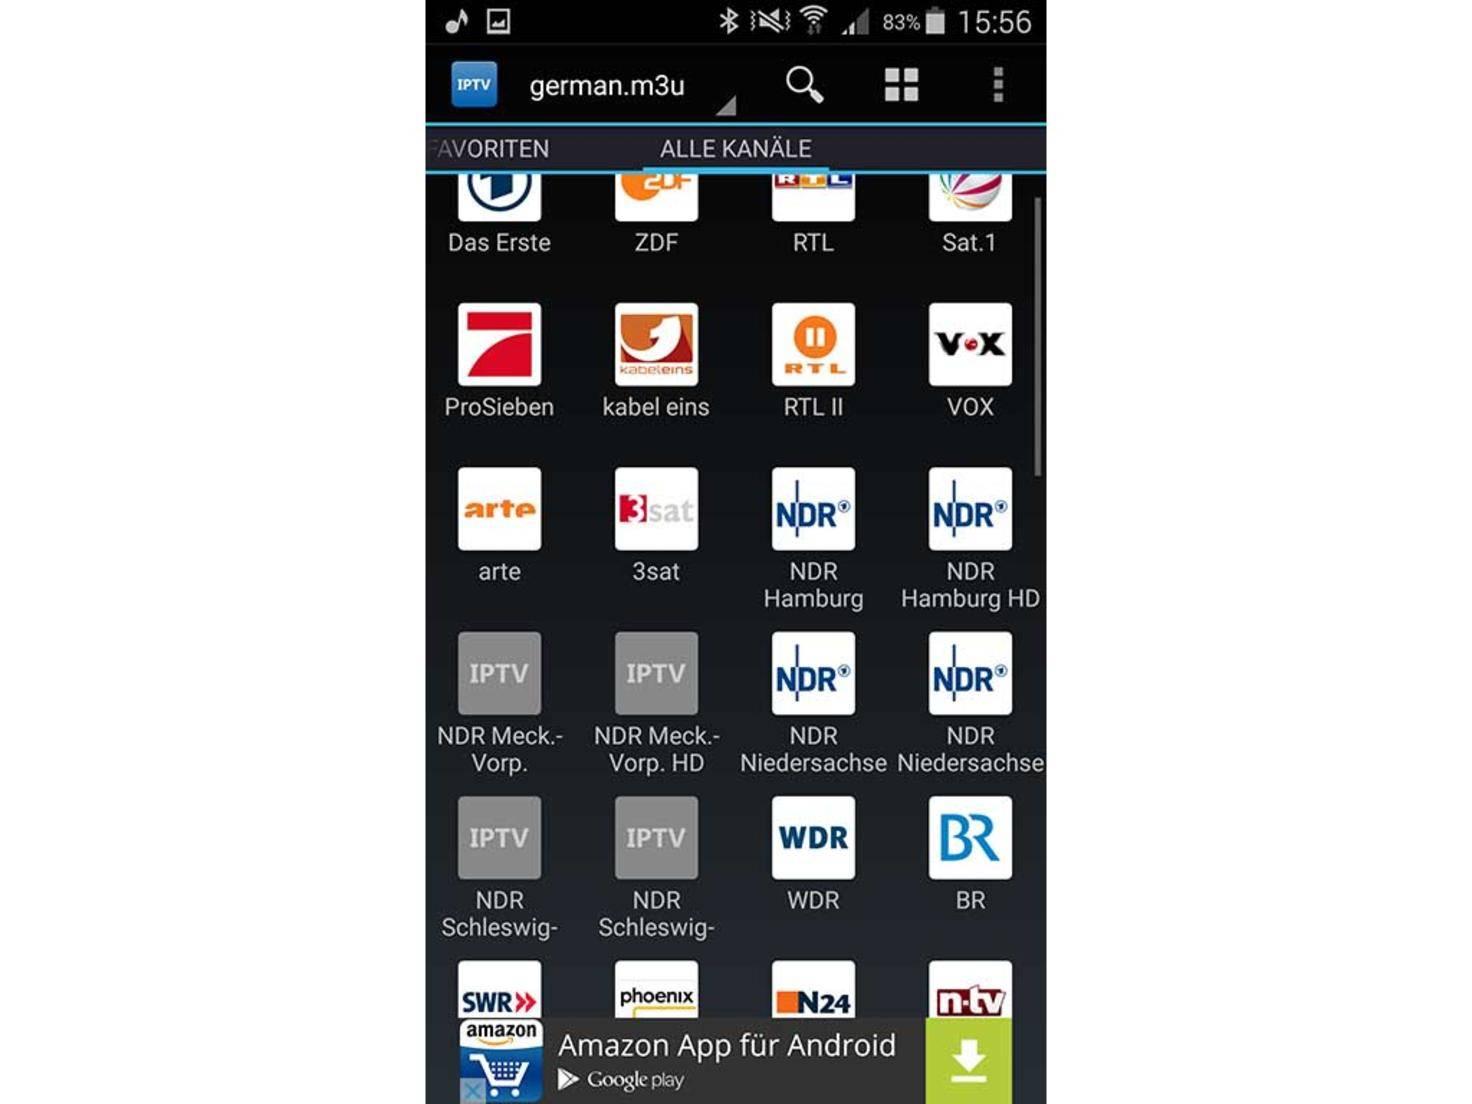 Fensehen per Android-Smartphone